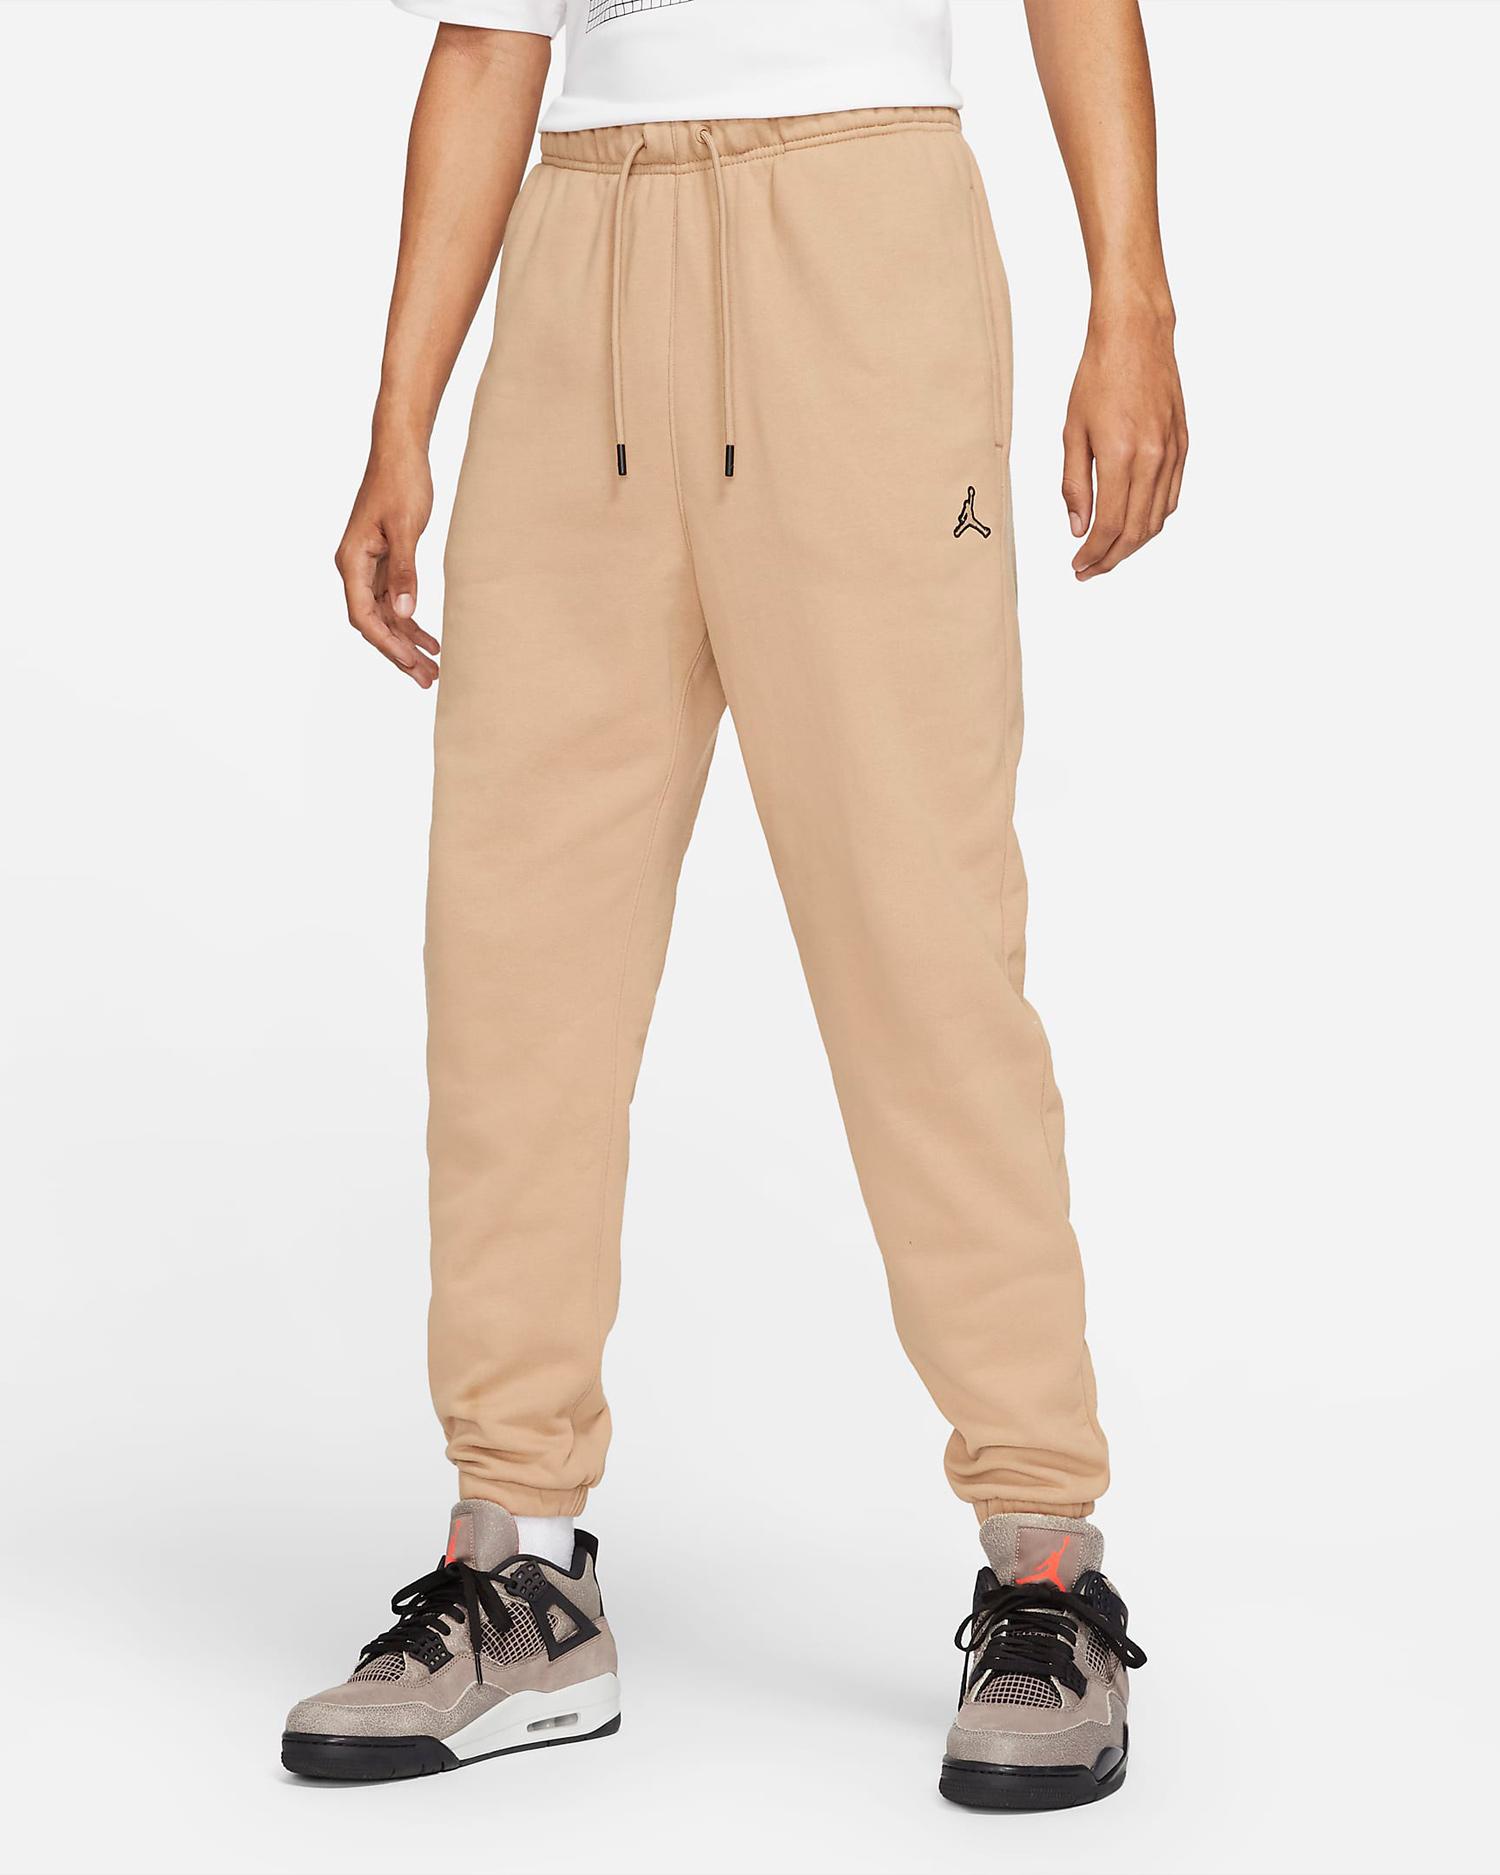 jordan-hemp-essential-fleece-pants-1